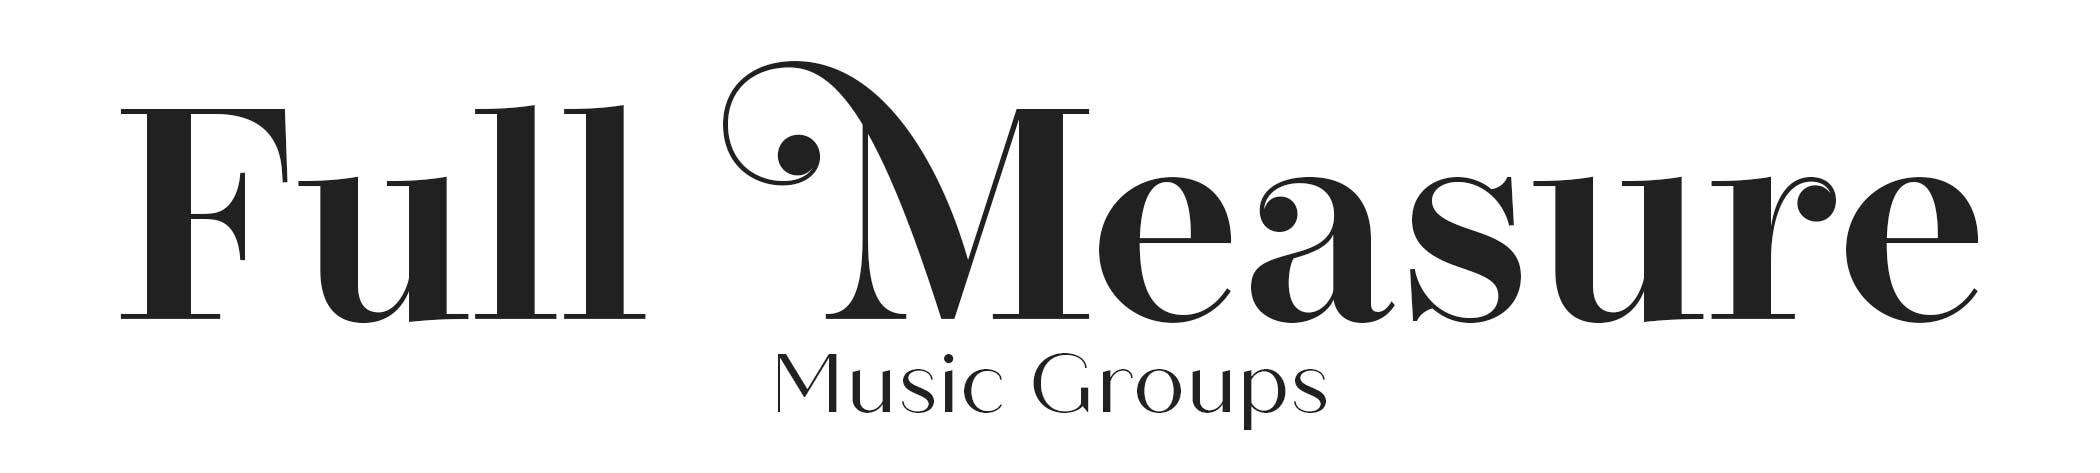 FM-Music-Groups